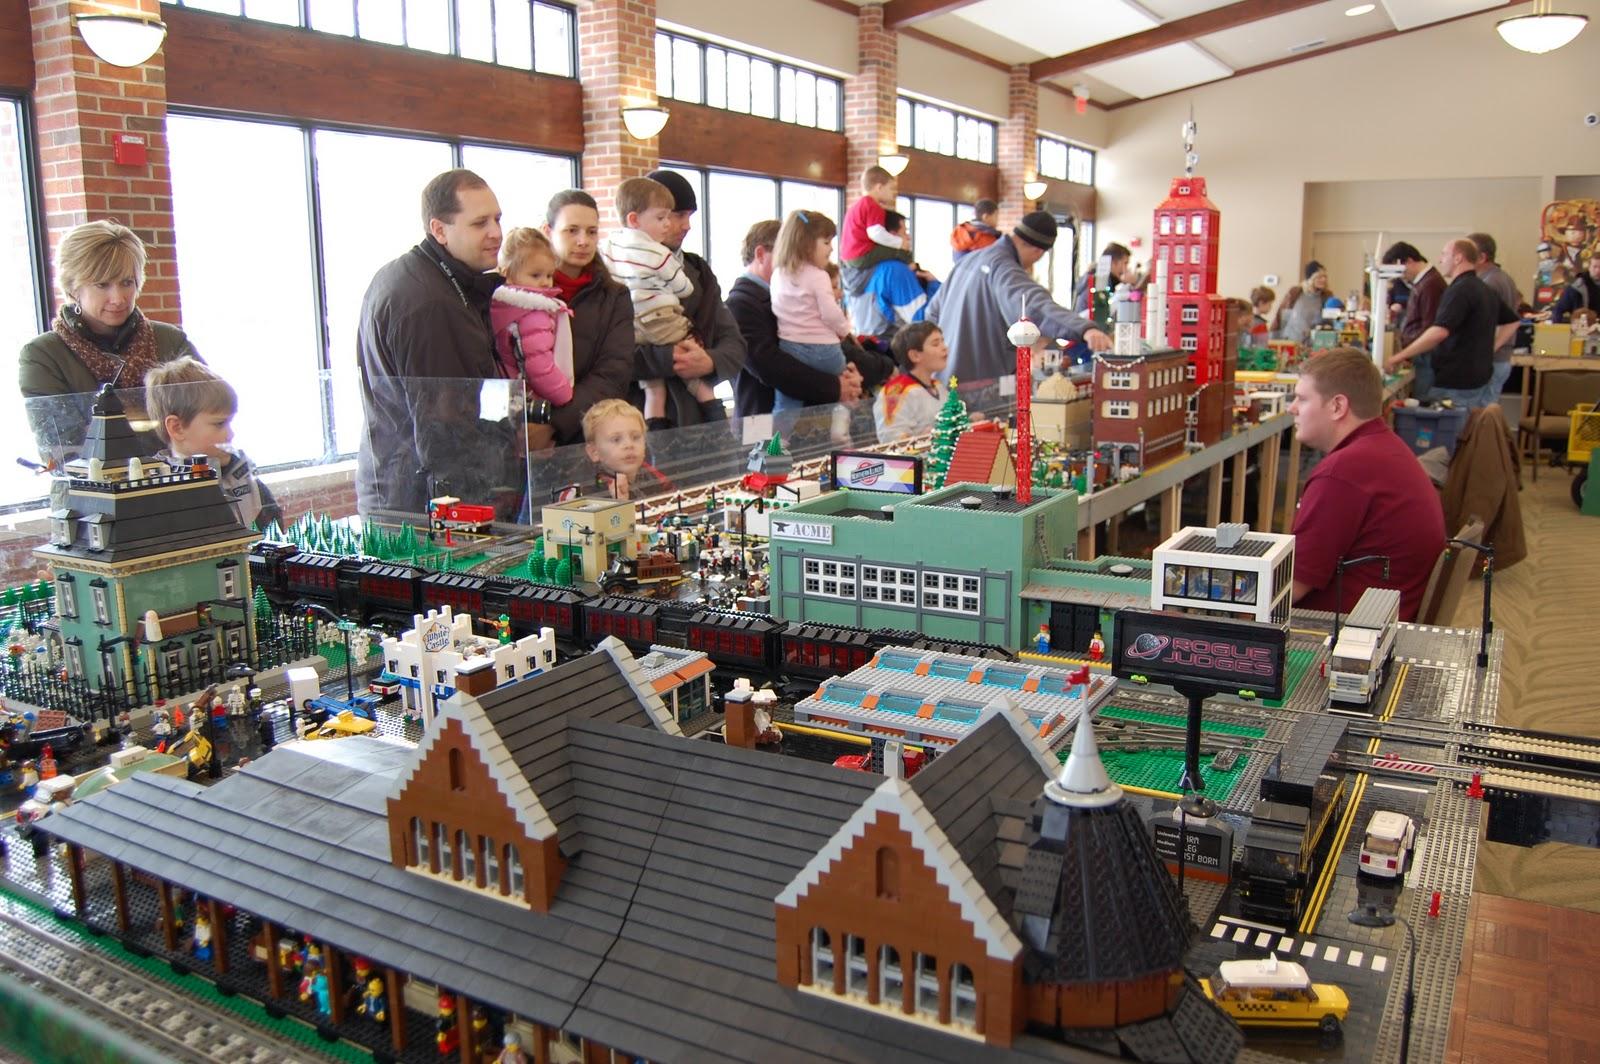 Kidlist activities for little kids lego train show for Cantigny le jardin